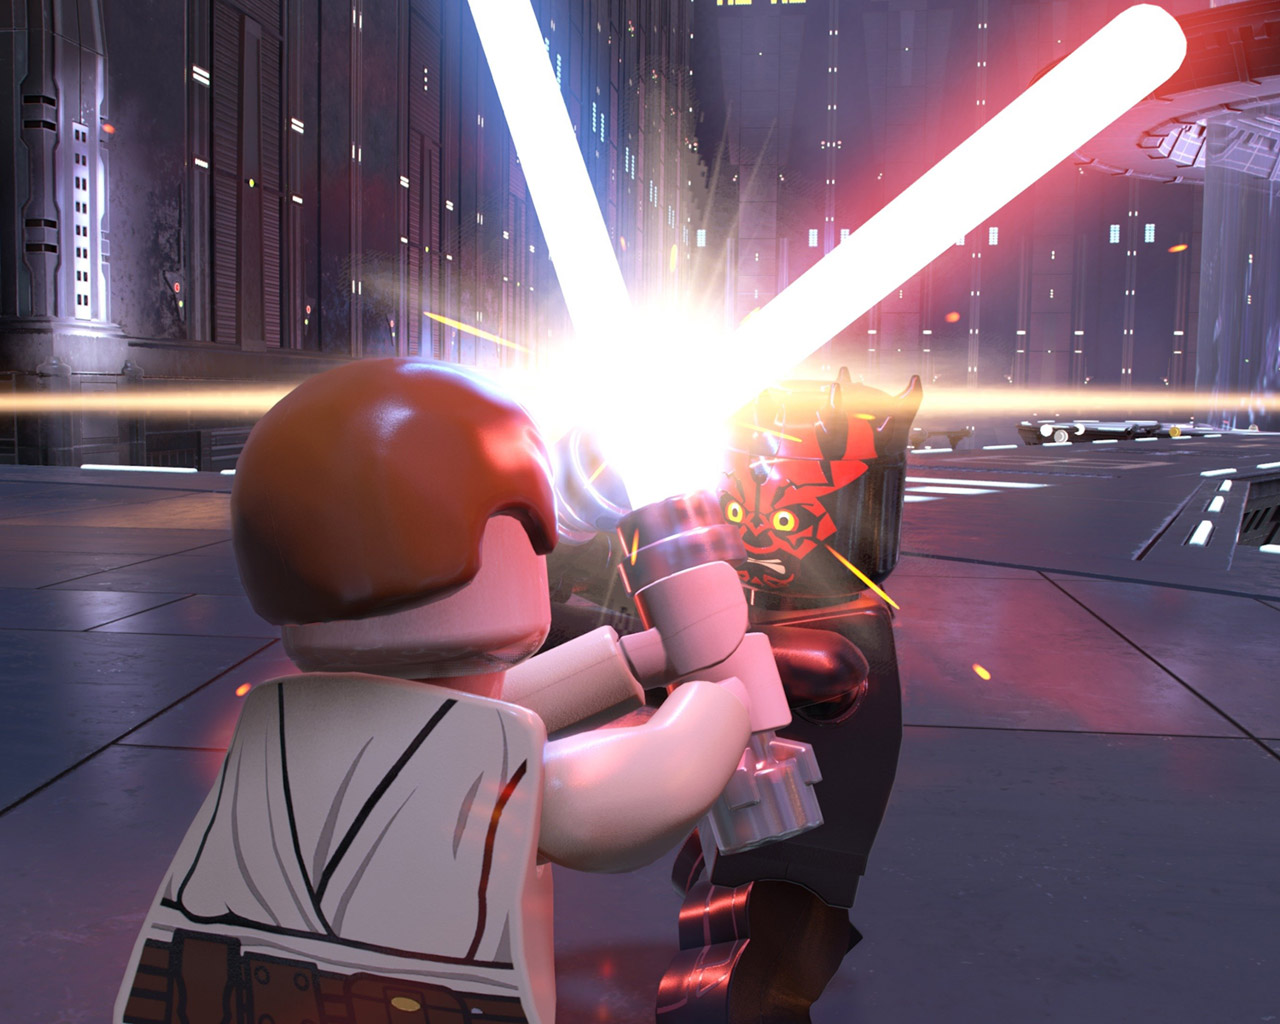 Free Lego Star Wars: The Skywalker Saga Wallpaper in 1280x1024